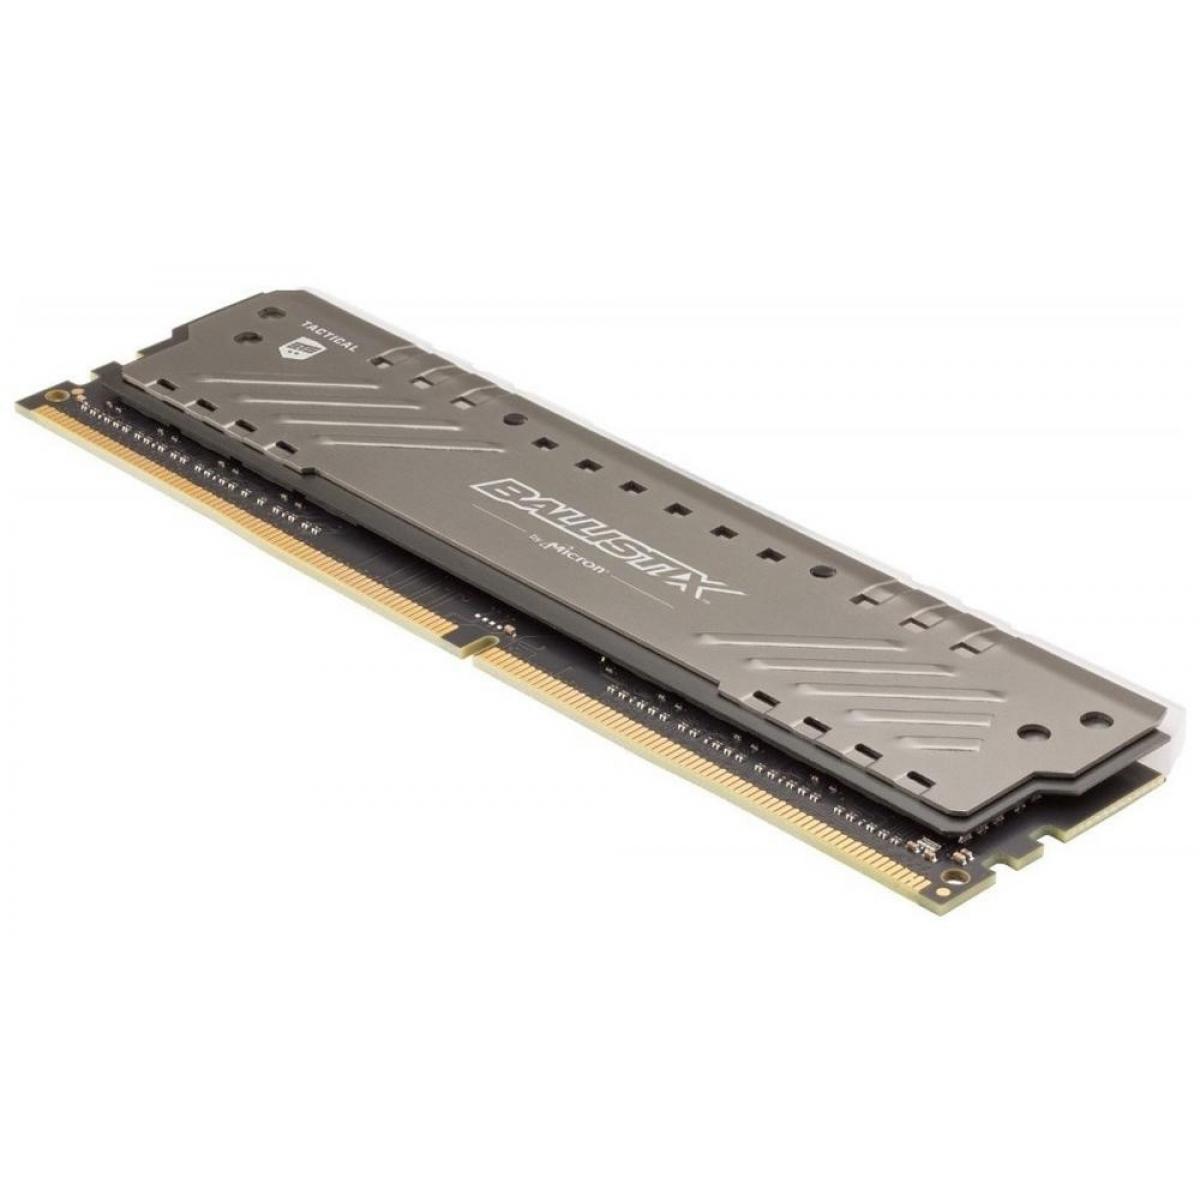 Memória DDR4 Crucial Ballistix Tactical Tracer RGB, 8GB 3000MHz, Grey, BLT8G4D30BET4K